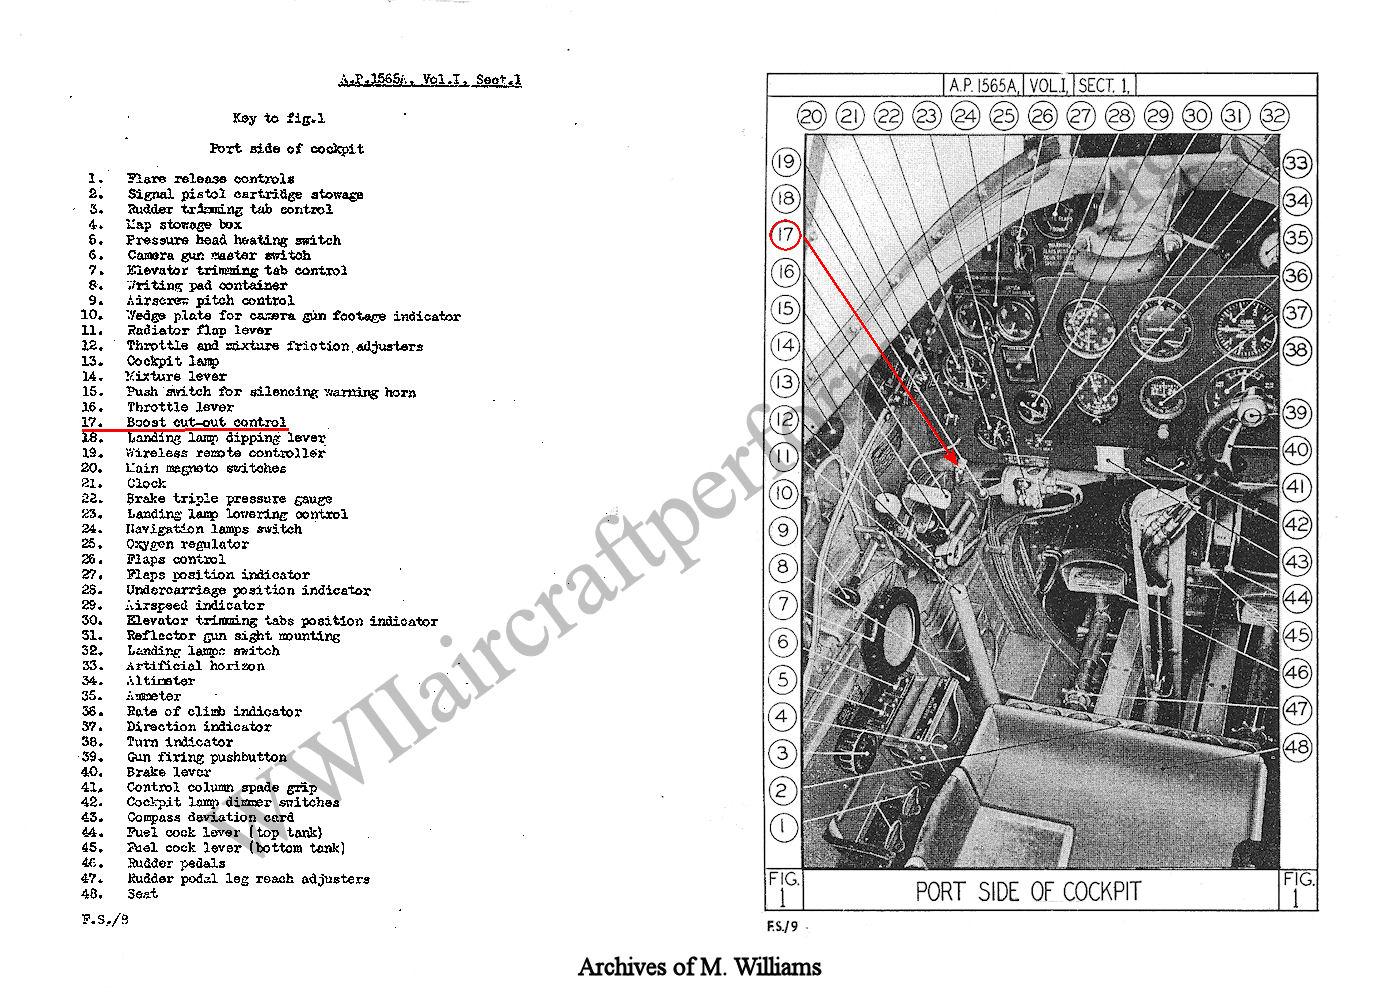 Did Wright Aeronautical Invent War Emergency Power